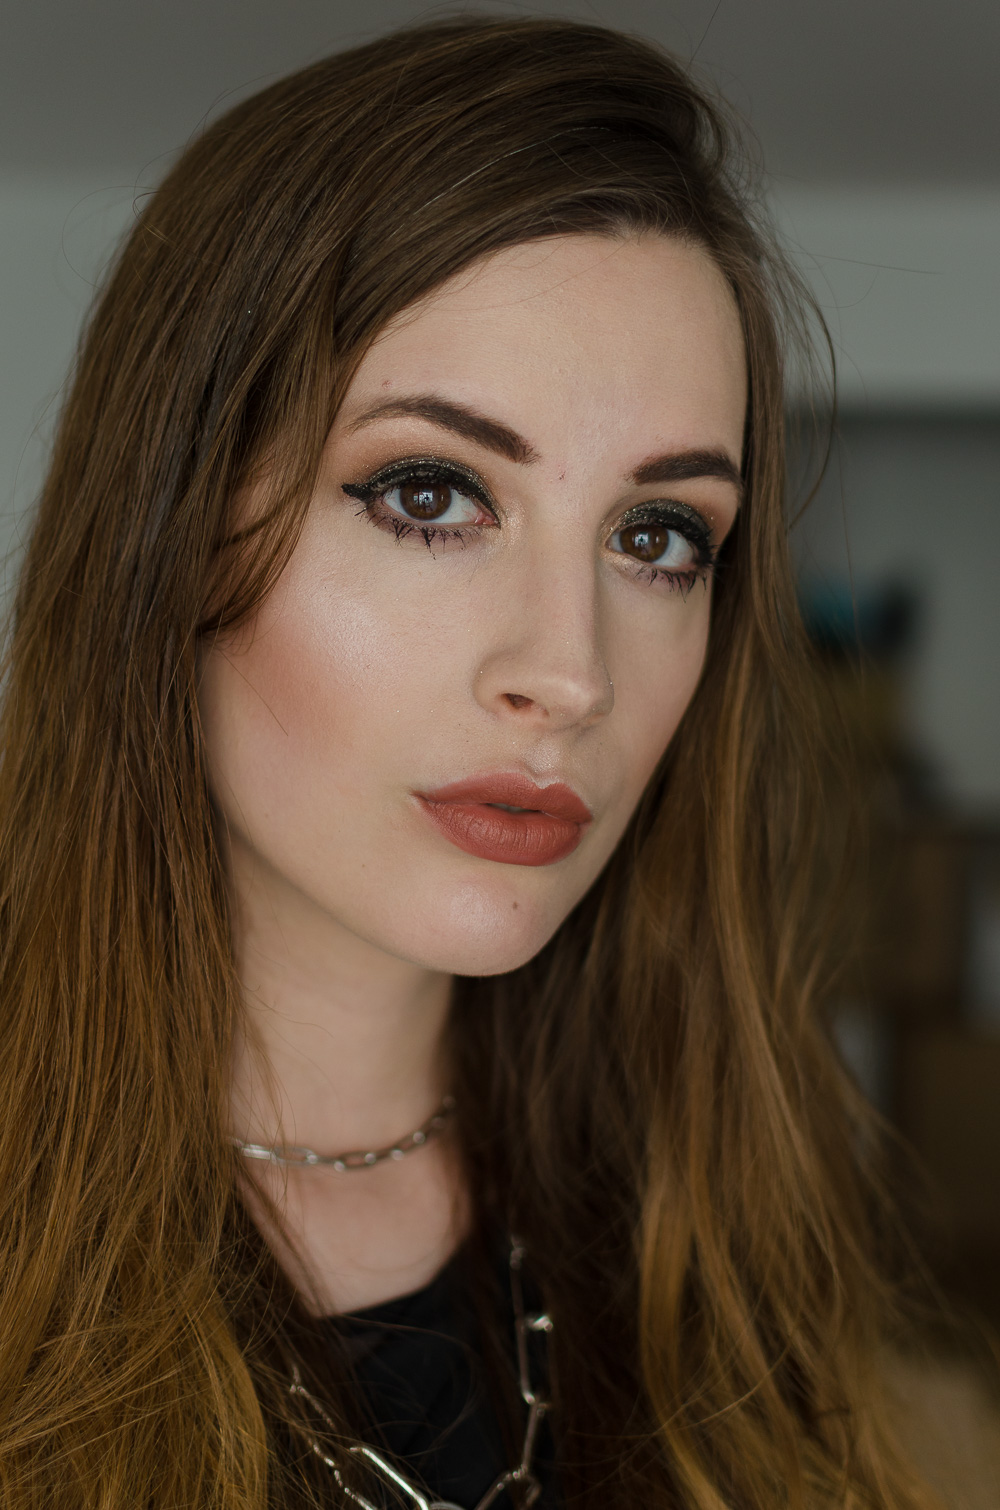 andysparkles-Beauty-Party Make-Up-Stila-MAC-Caro Daur